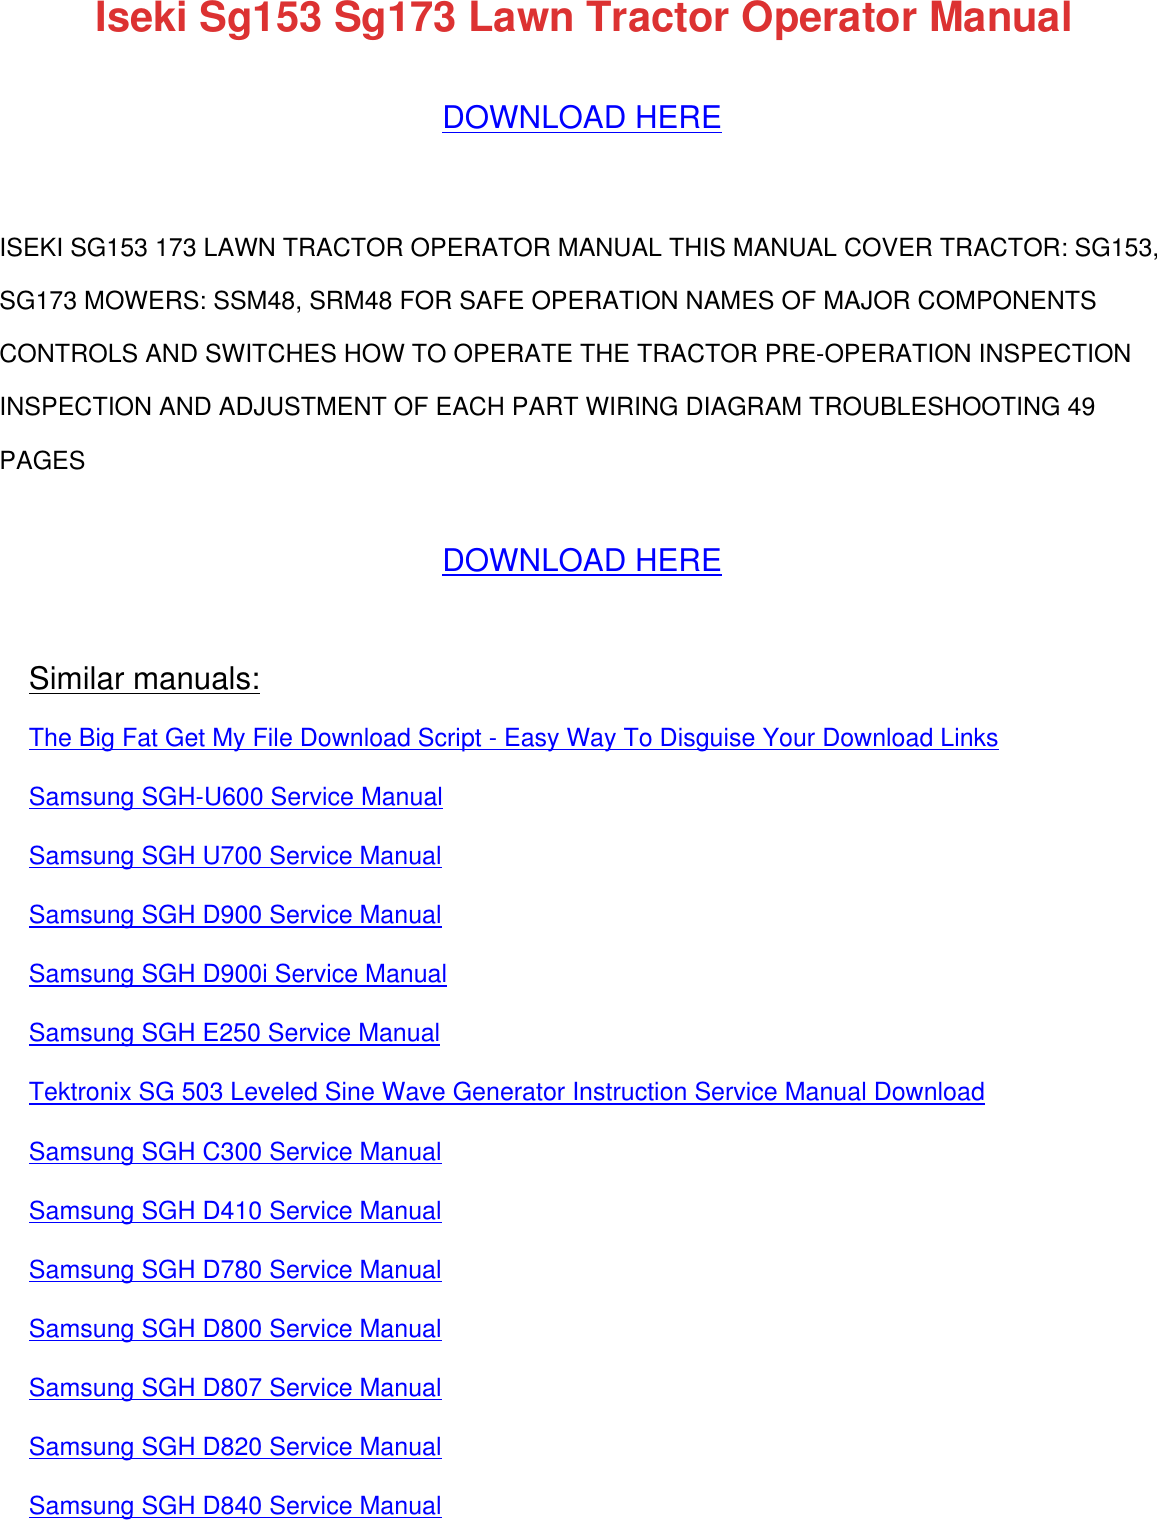 182287082 iseki sg153 sg173 lawn tractor operator manual 182287082 iseki sg153 sg173 lawn tractor operator manual fandeluxe Image collections